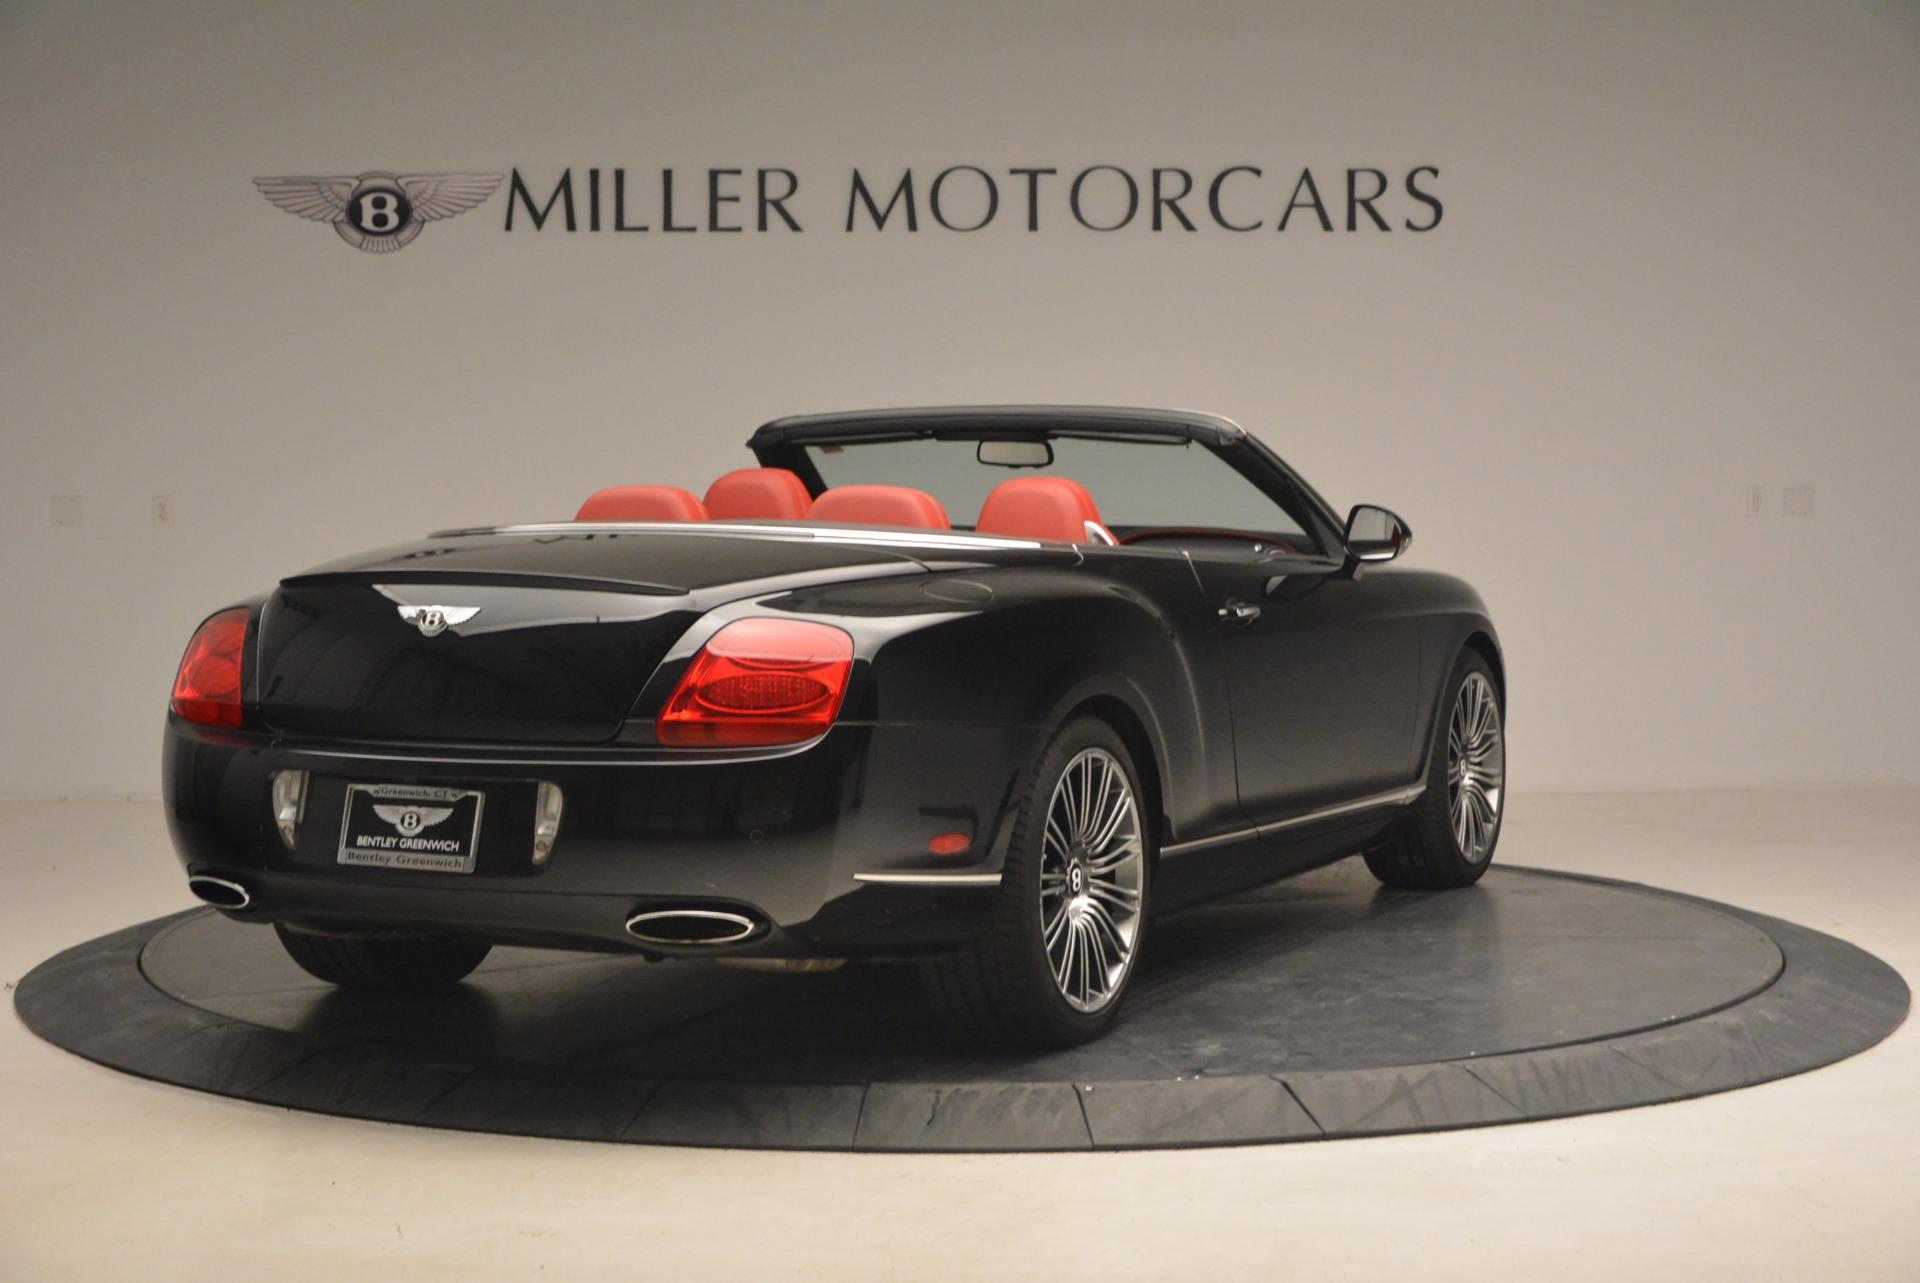 Used 2010 Bentley Continental GT Speed For Sale In Westport, CT 1298_p7